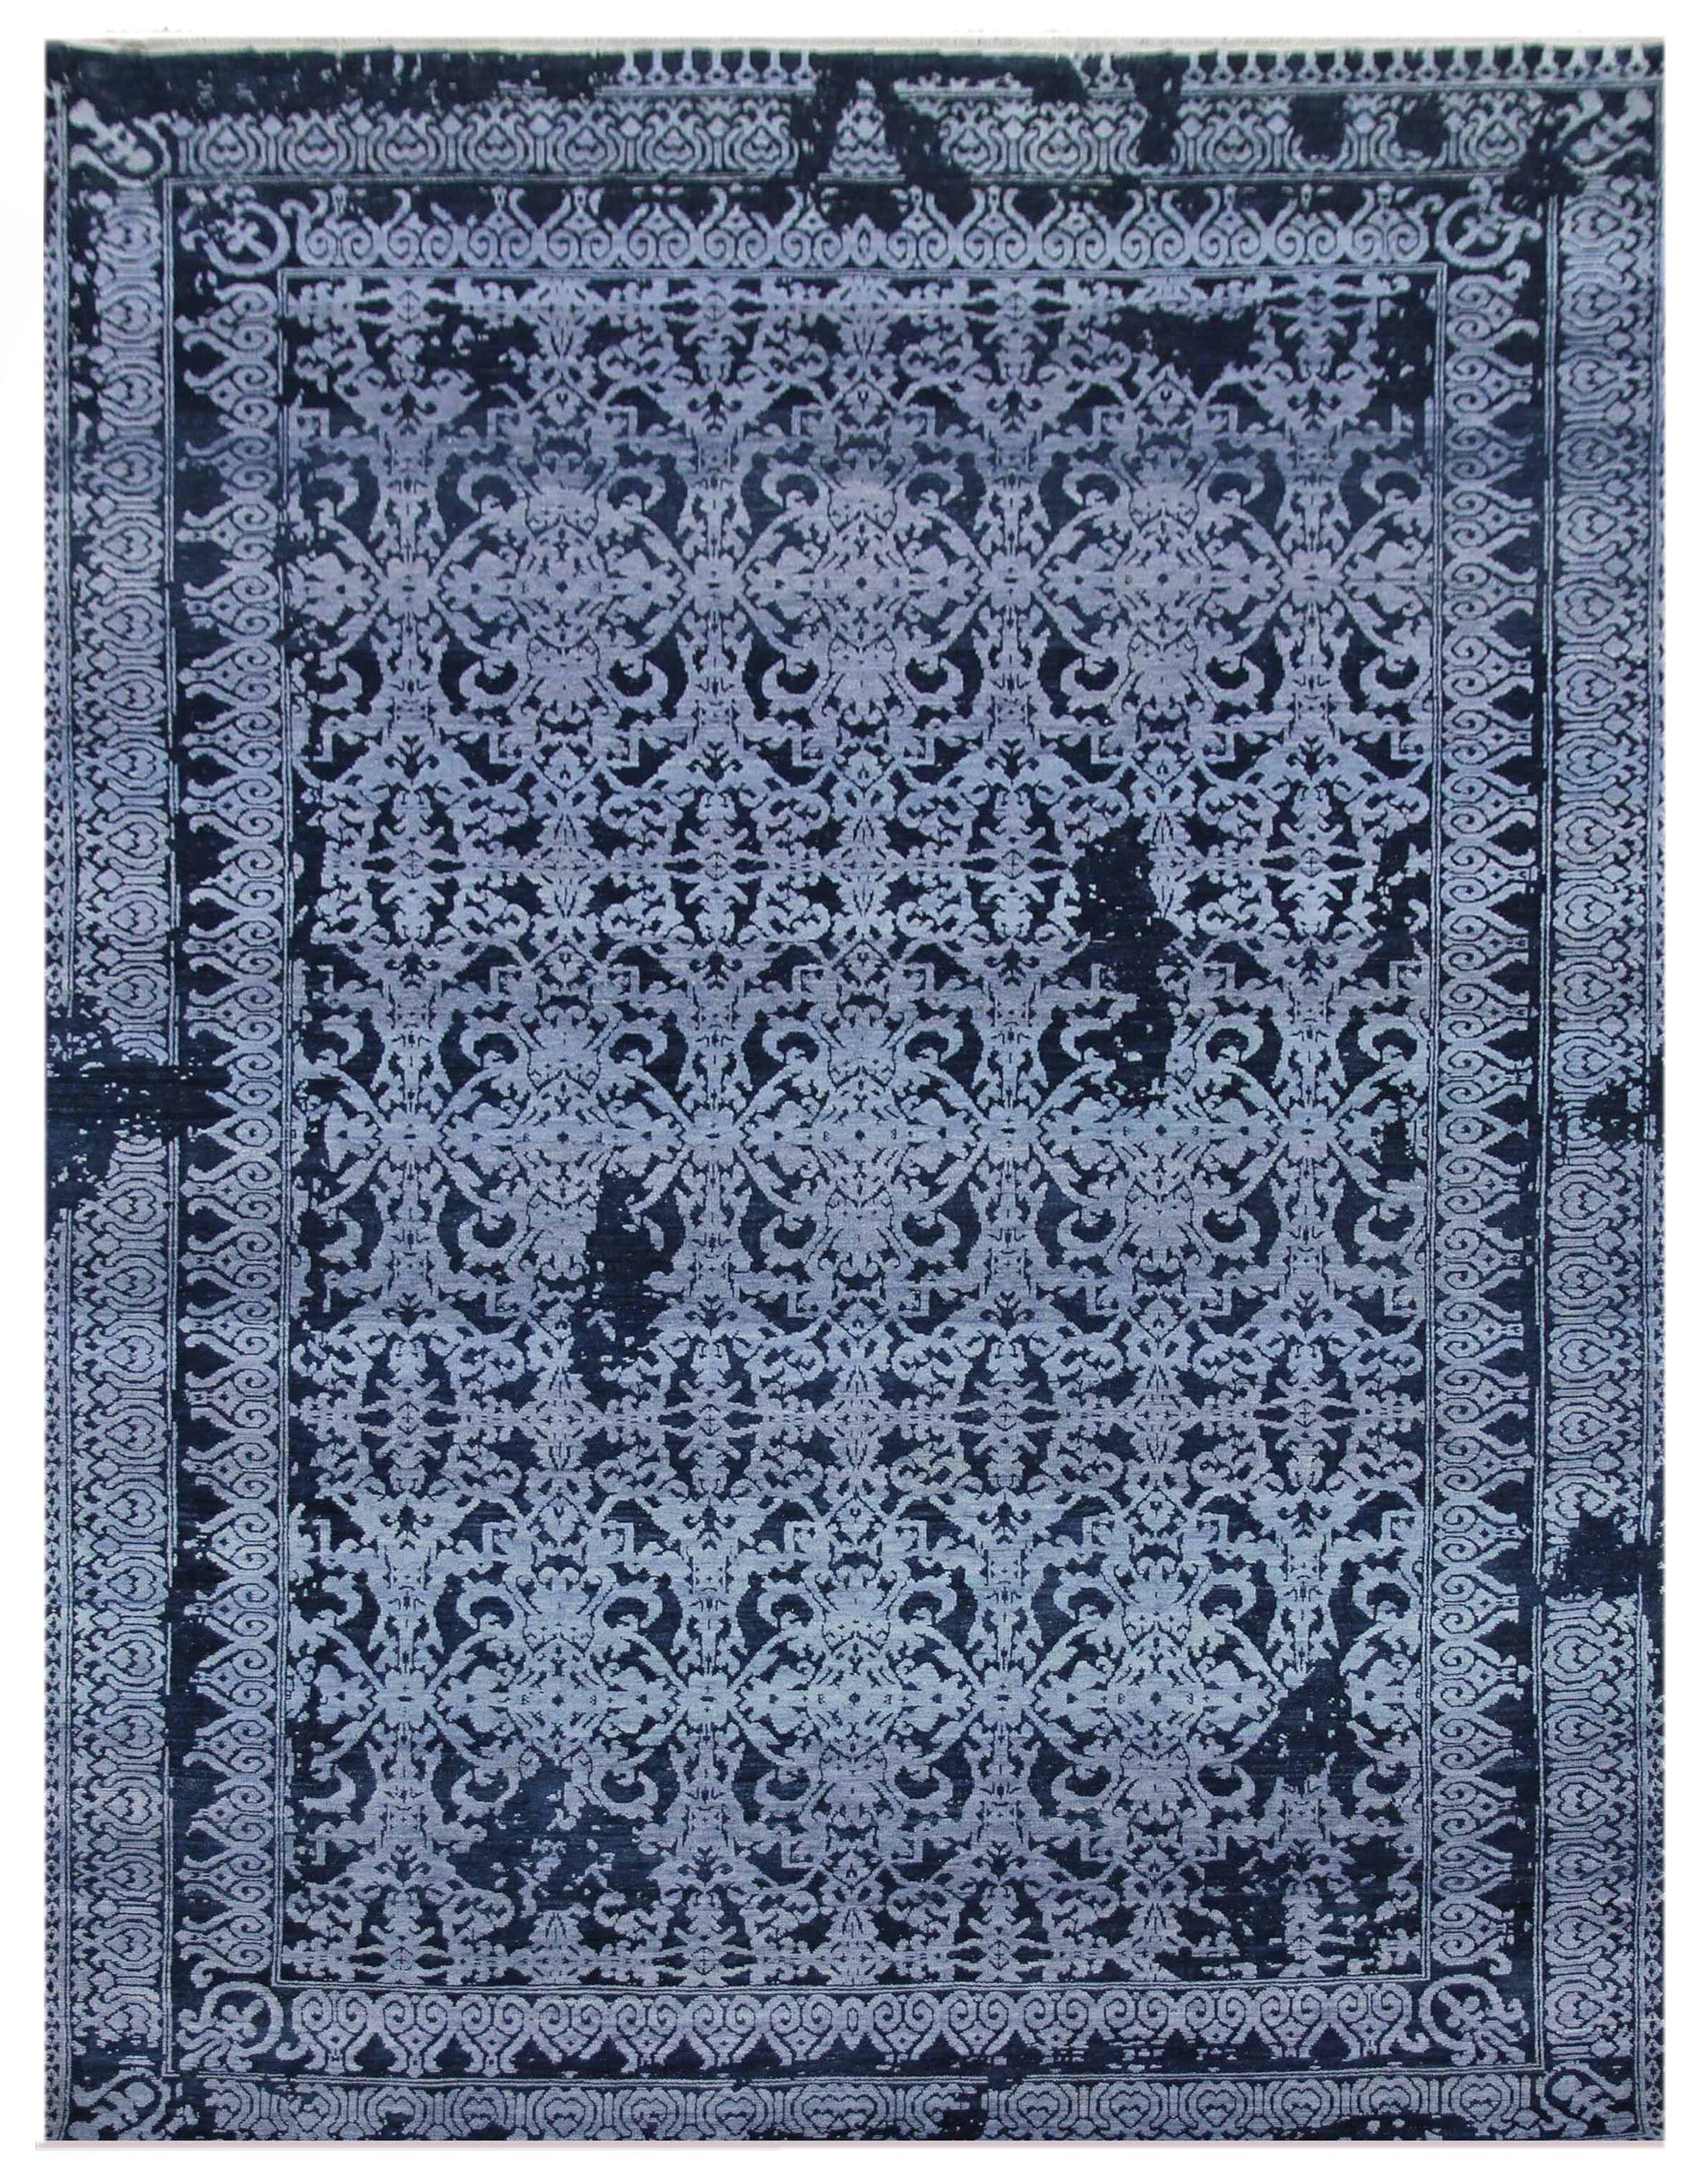 Lexington Hand-Knotted Blue/Ivory Area Rug Rug Size: Rectangle6' x 9'